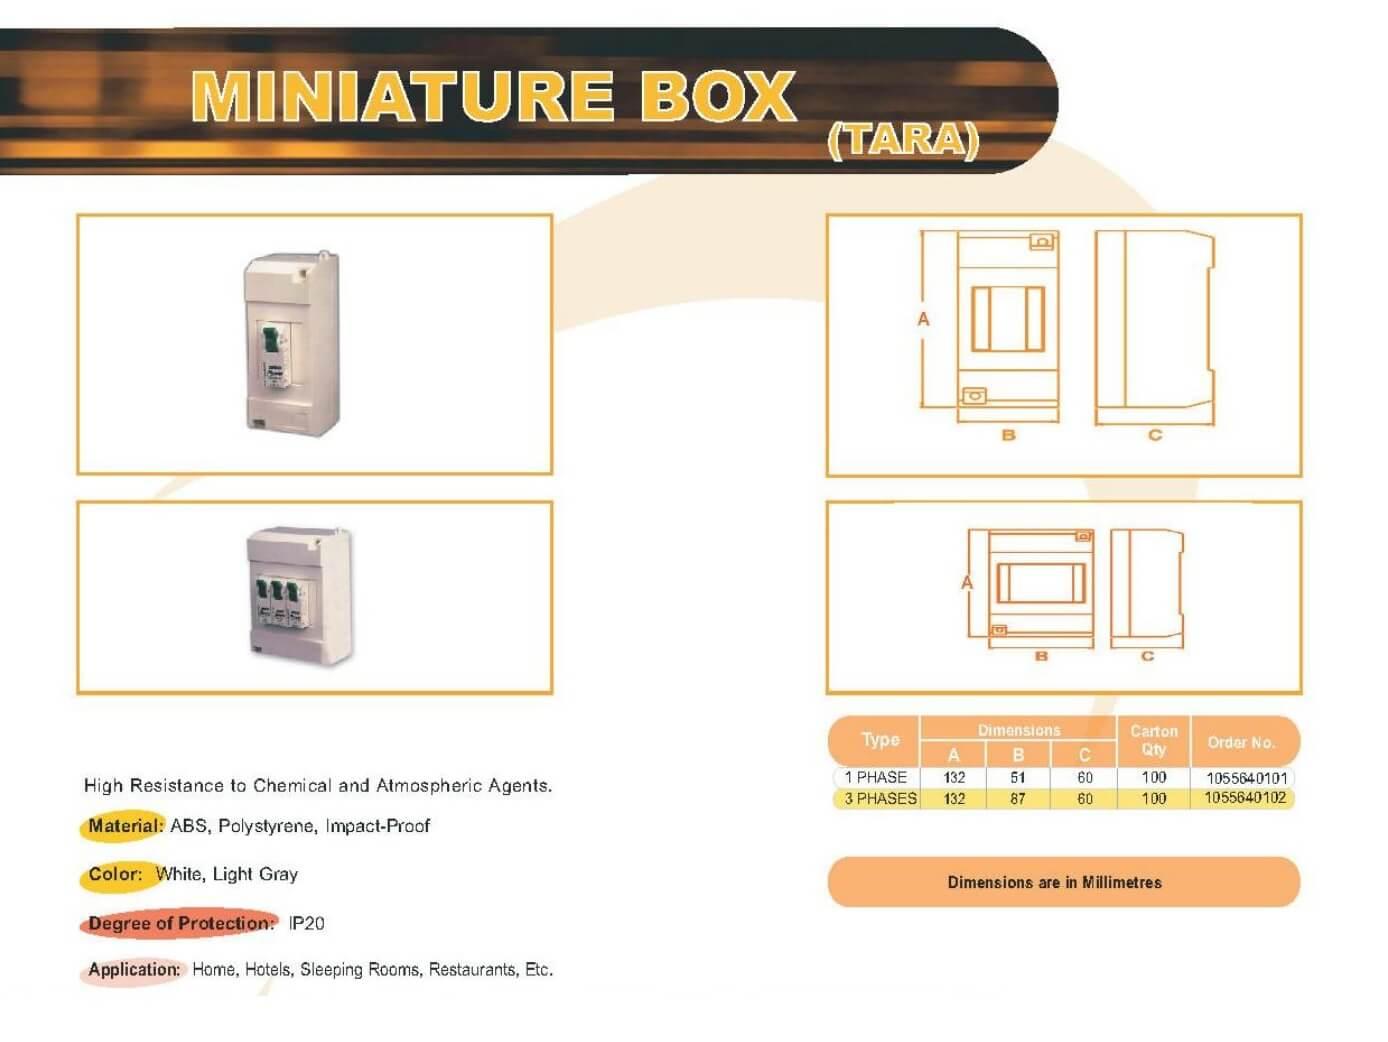 Miniature Box Technical Datasheet